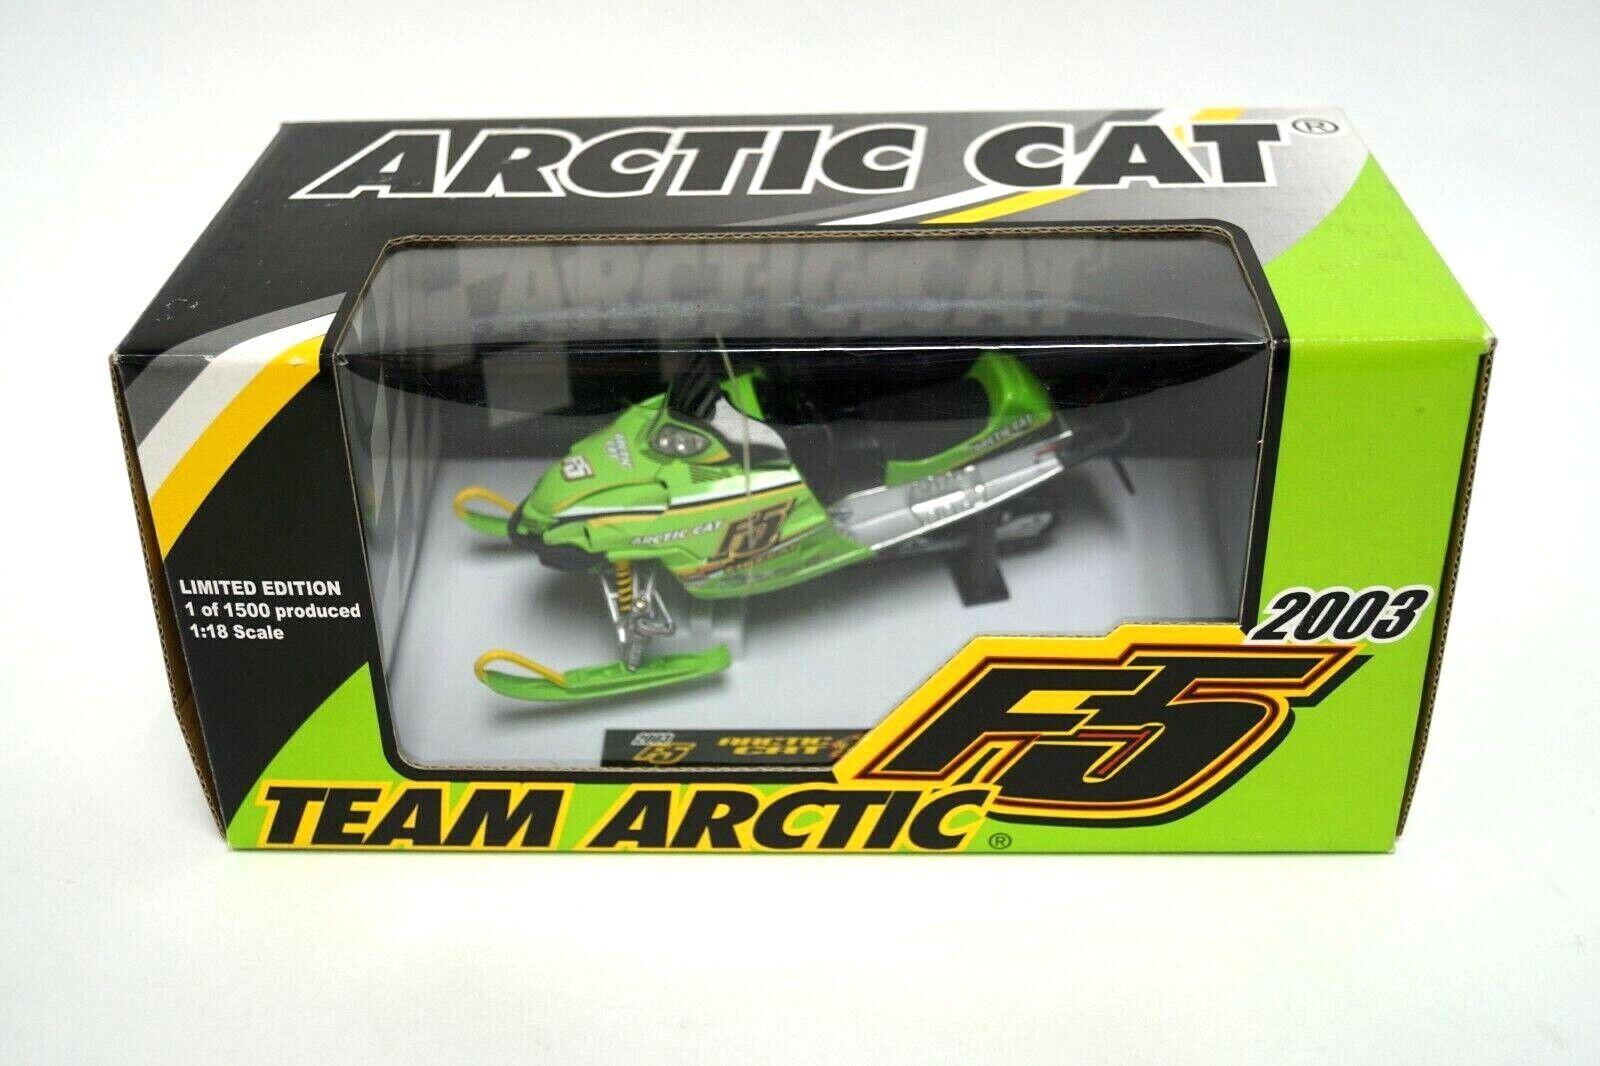 2003 Arctic Cat F5 Firecat Motoneige DIE CAST 1 18 Scale Model Toy 4239-100